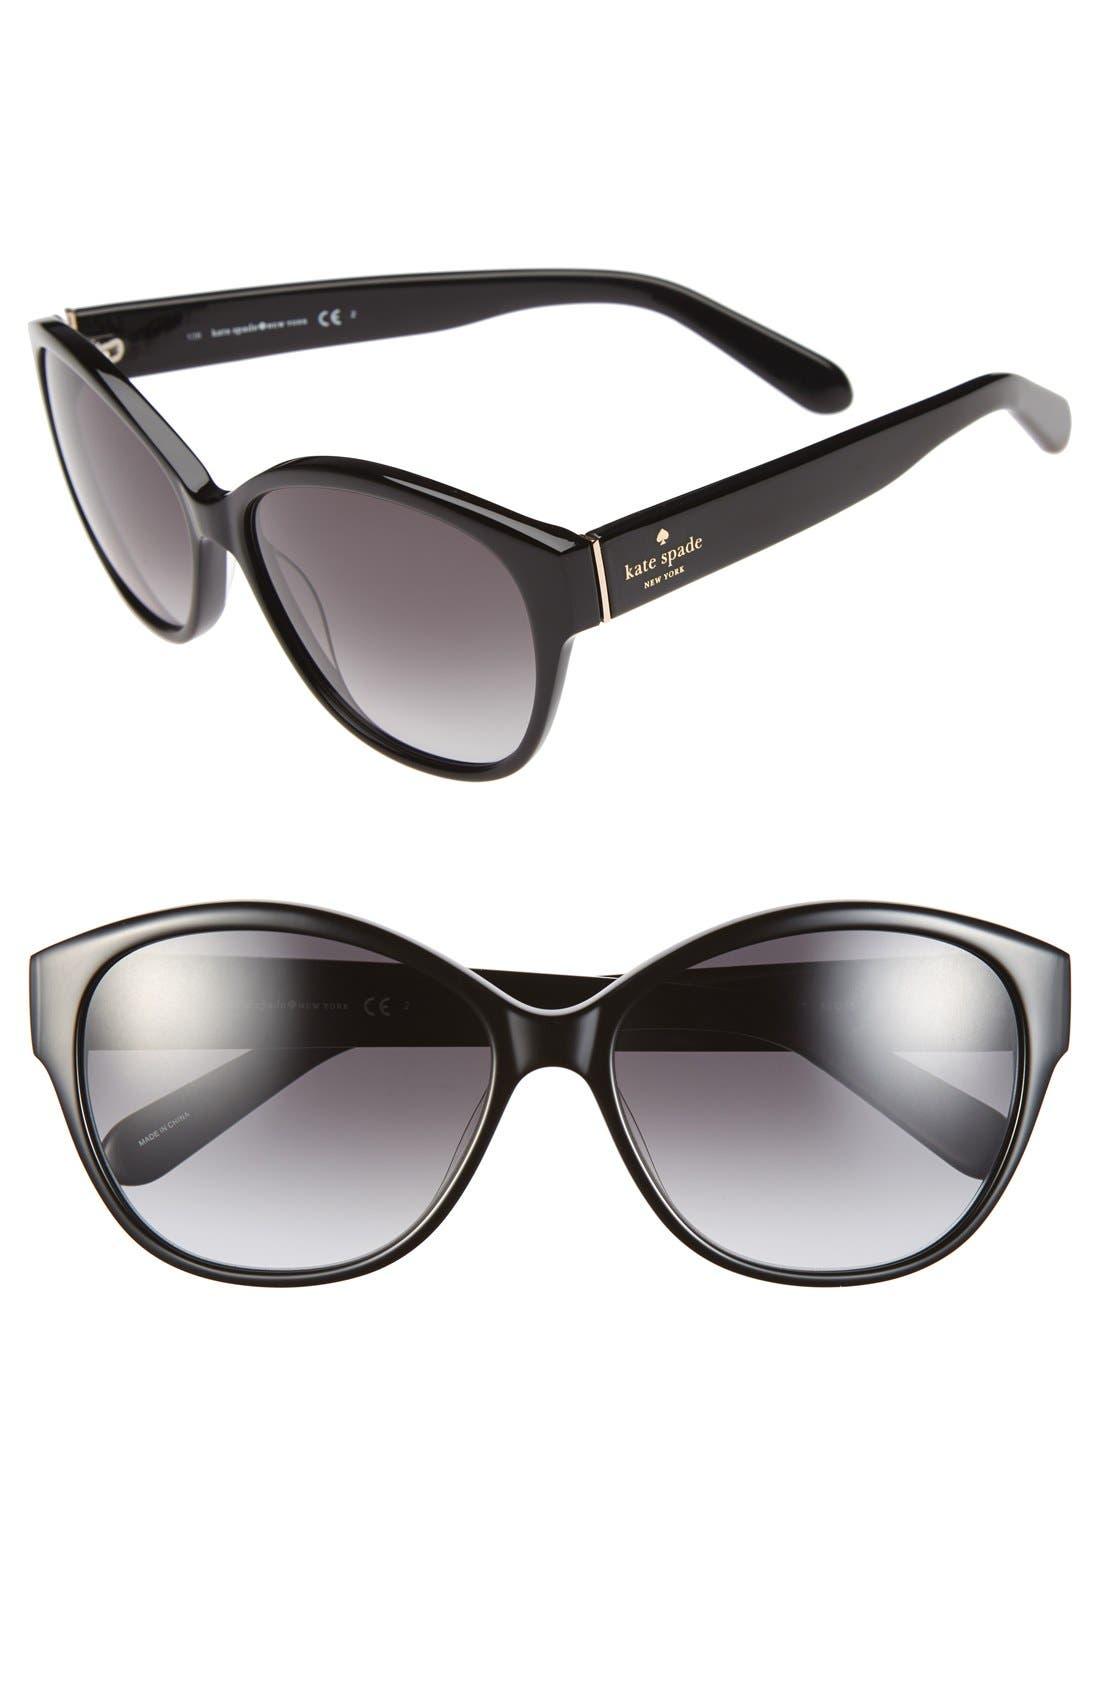 Main Image - kate spade new york 56mm sunglasses